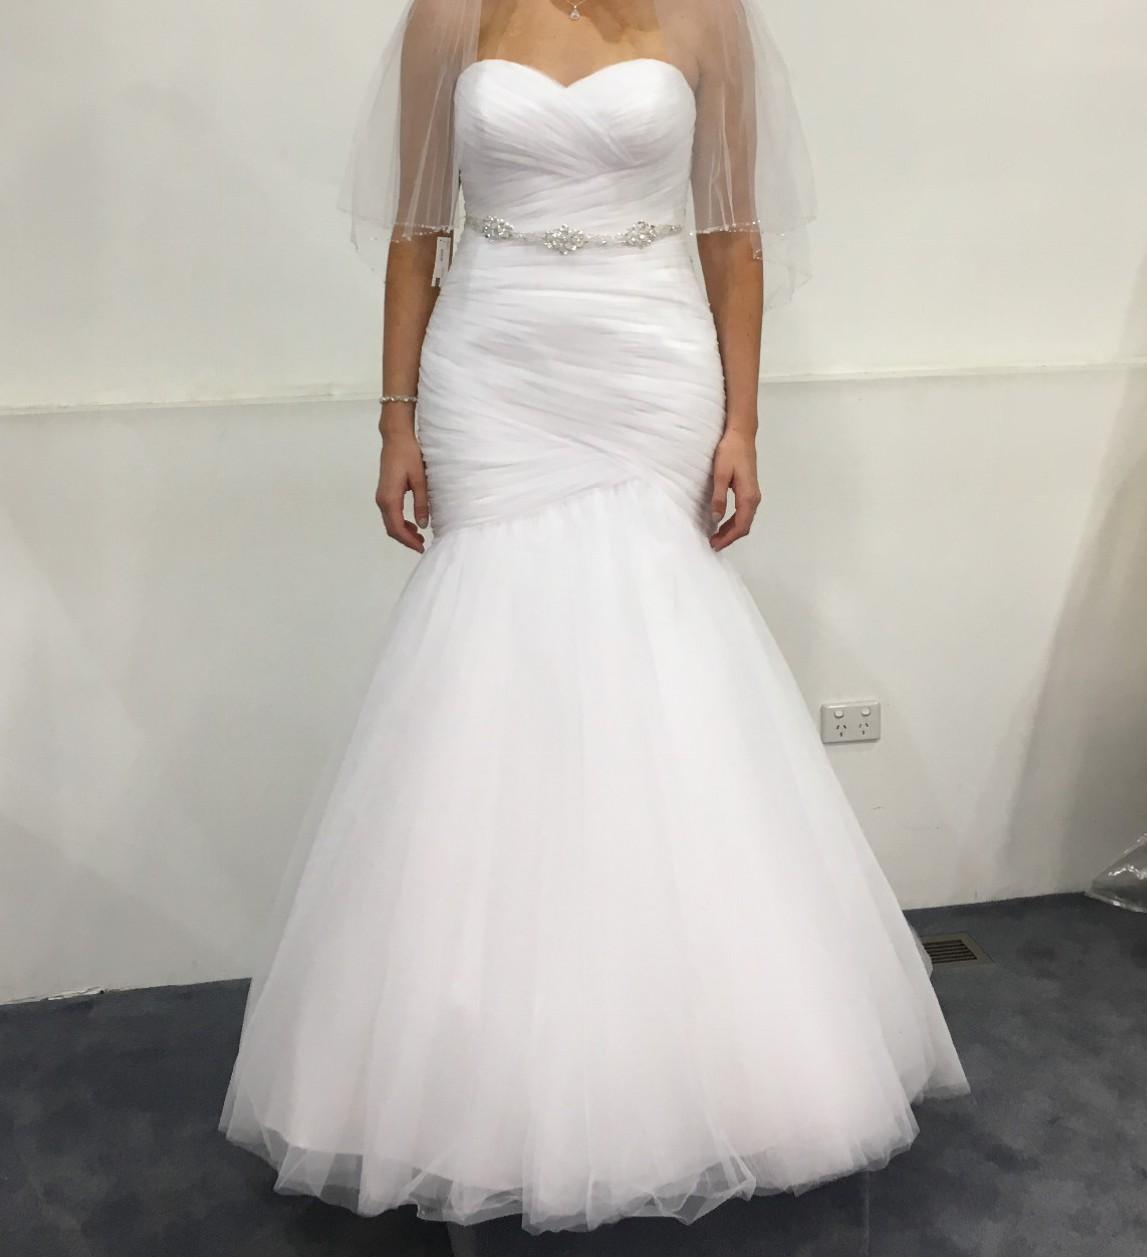 Morilee 5108 Used Wedding Dress Save 70